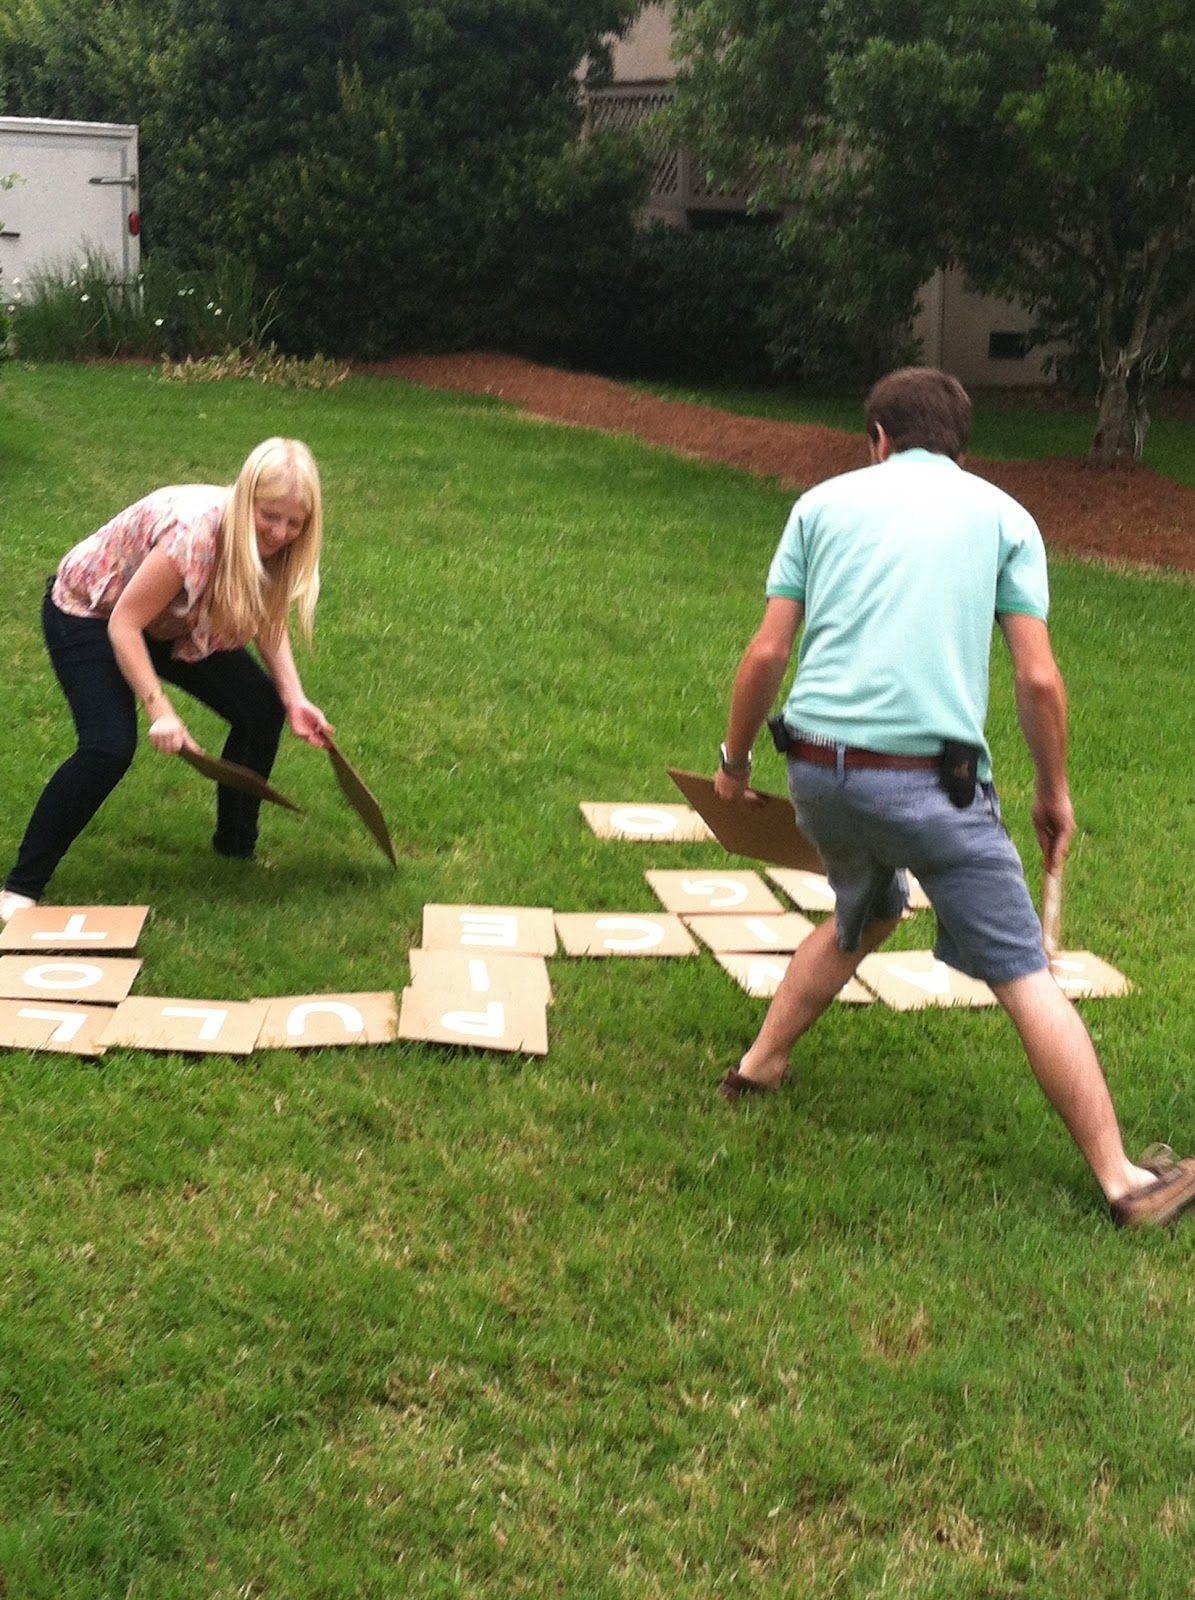 Diy outdoor bananagrams make your own backyard version for Good backyard games